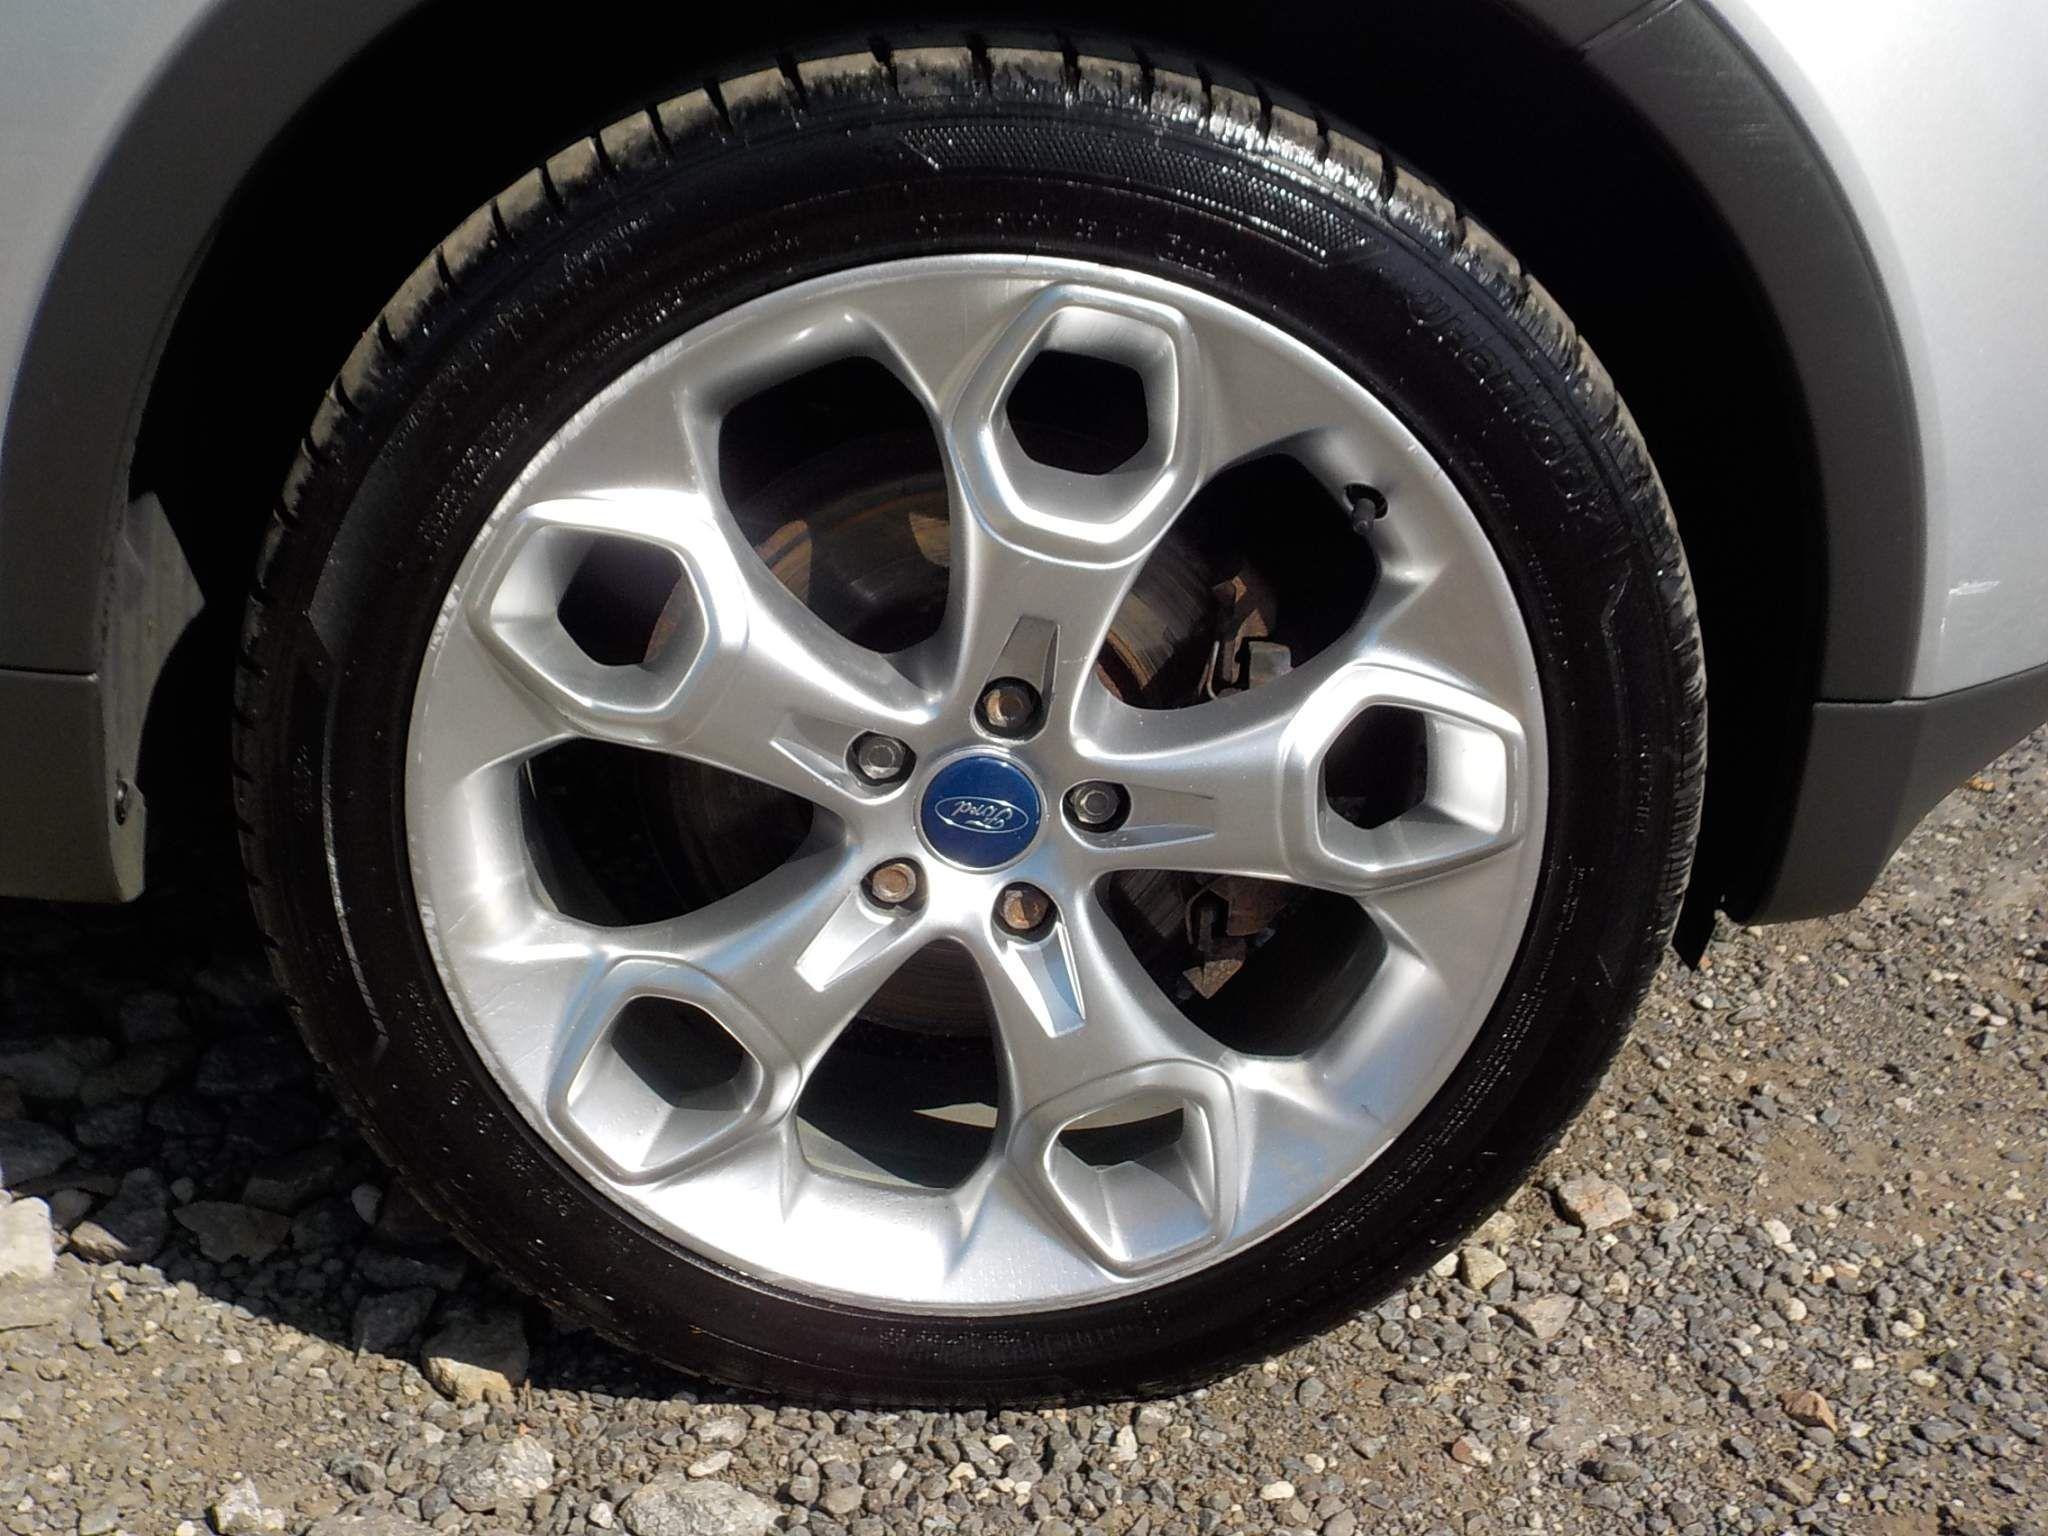 Ford Kuga 2.0 TDCi Titanium 4x4 5dr